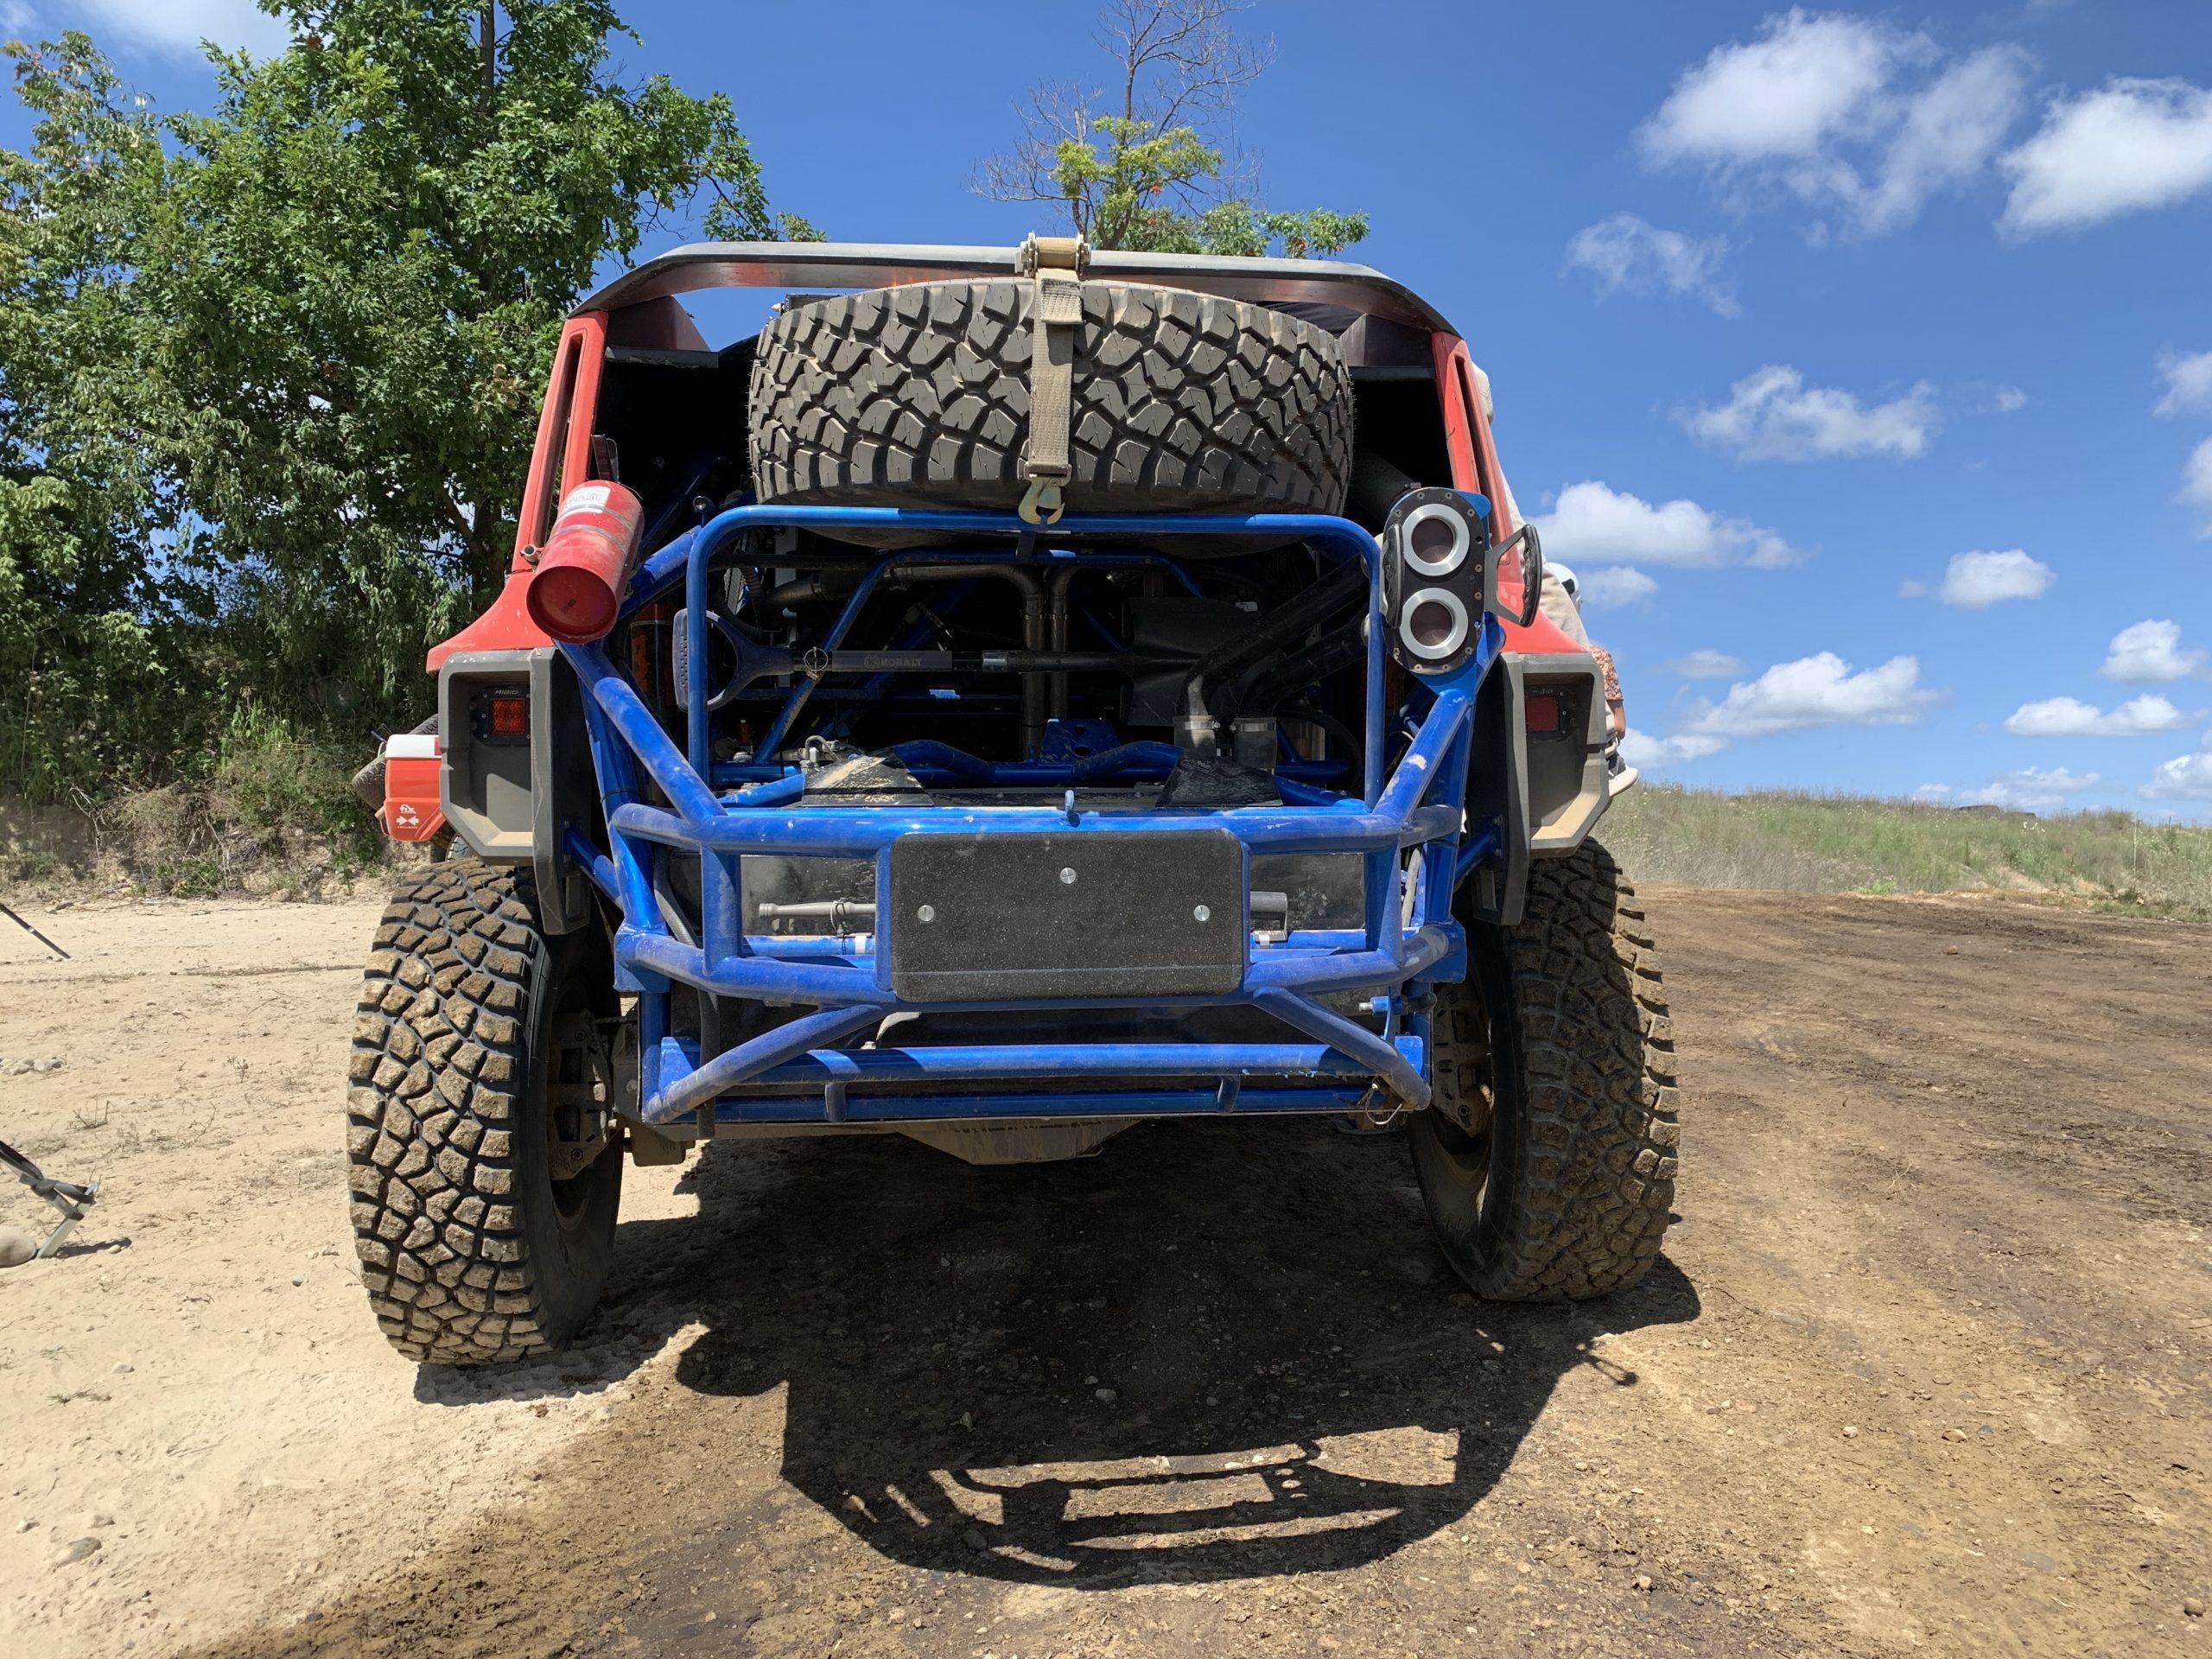 Bronco r rear spare tire